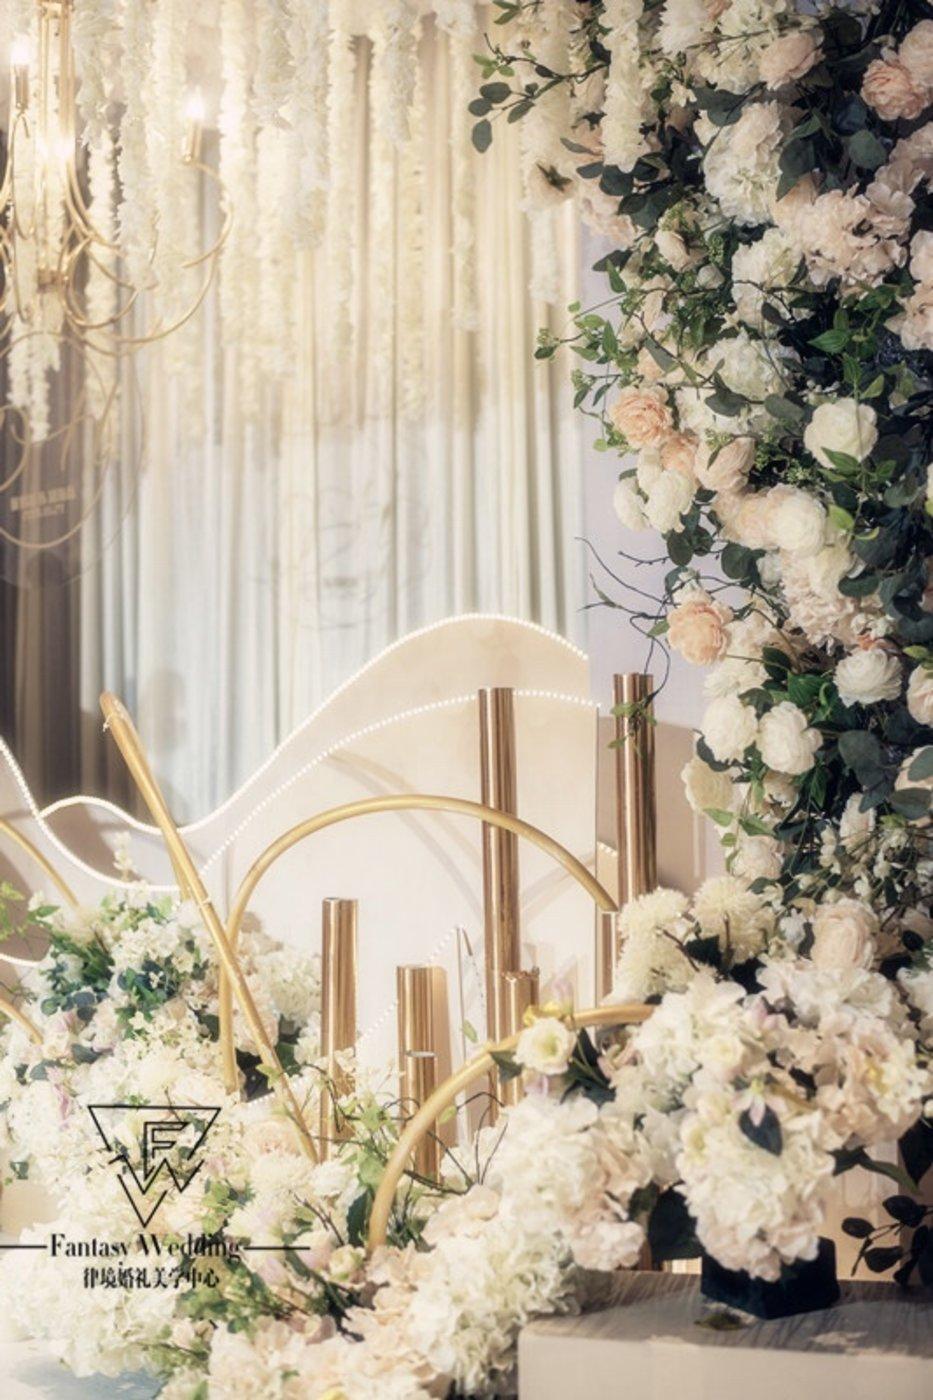 「Fantasy Wedding」丰大国际6